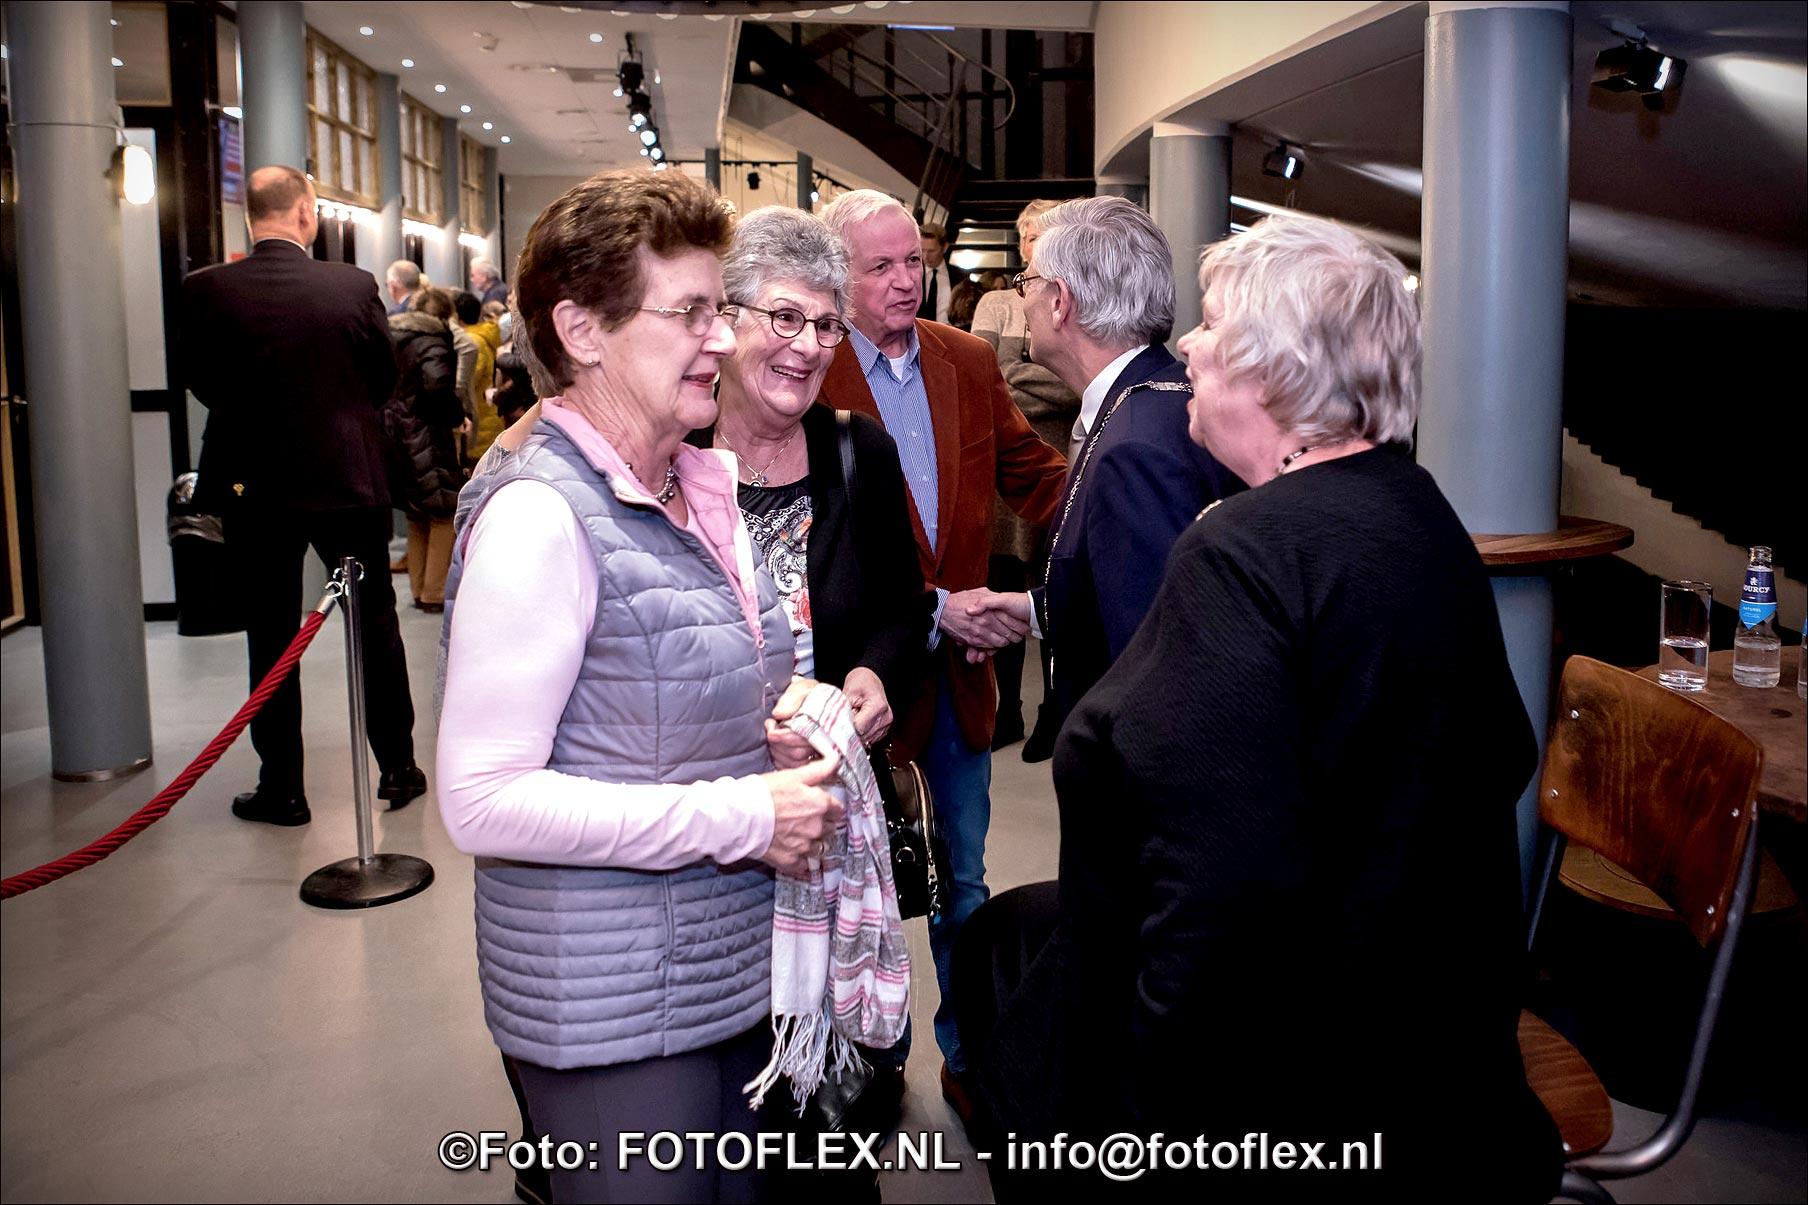 0101-CopyrightFOTOFLEX.NL07012020